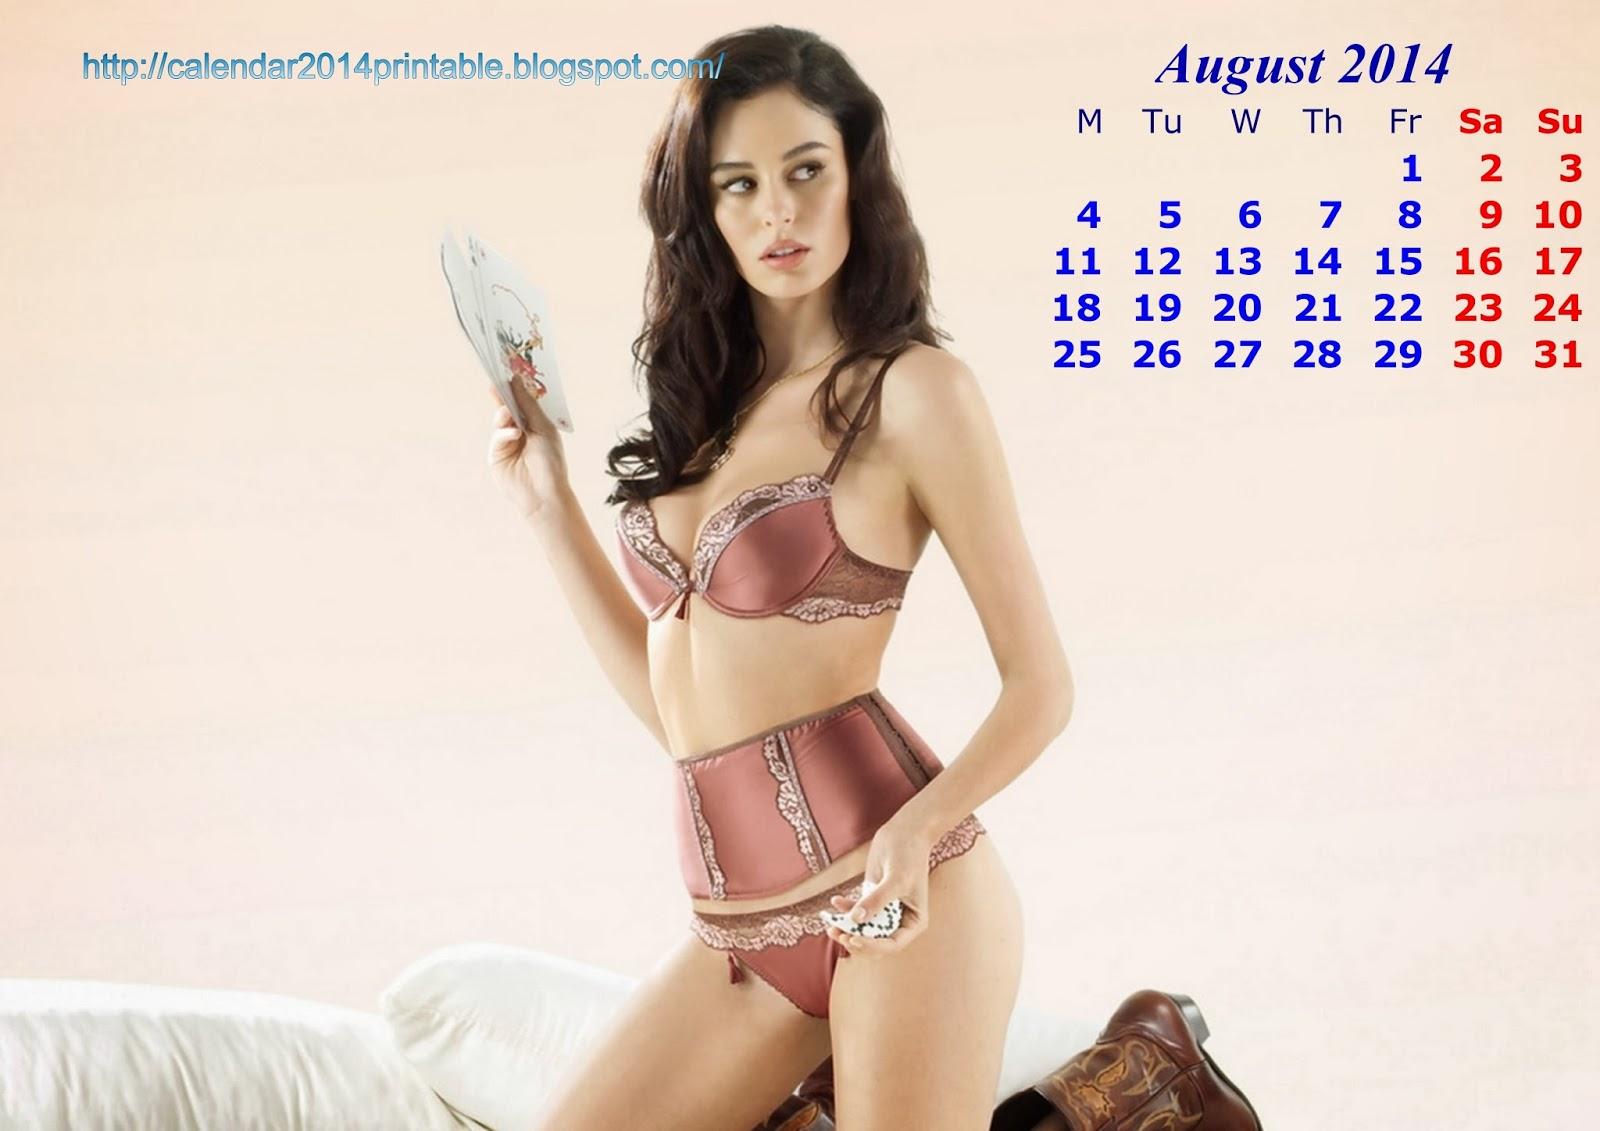 Asian calendar girl emi netvideogirls 1